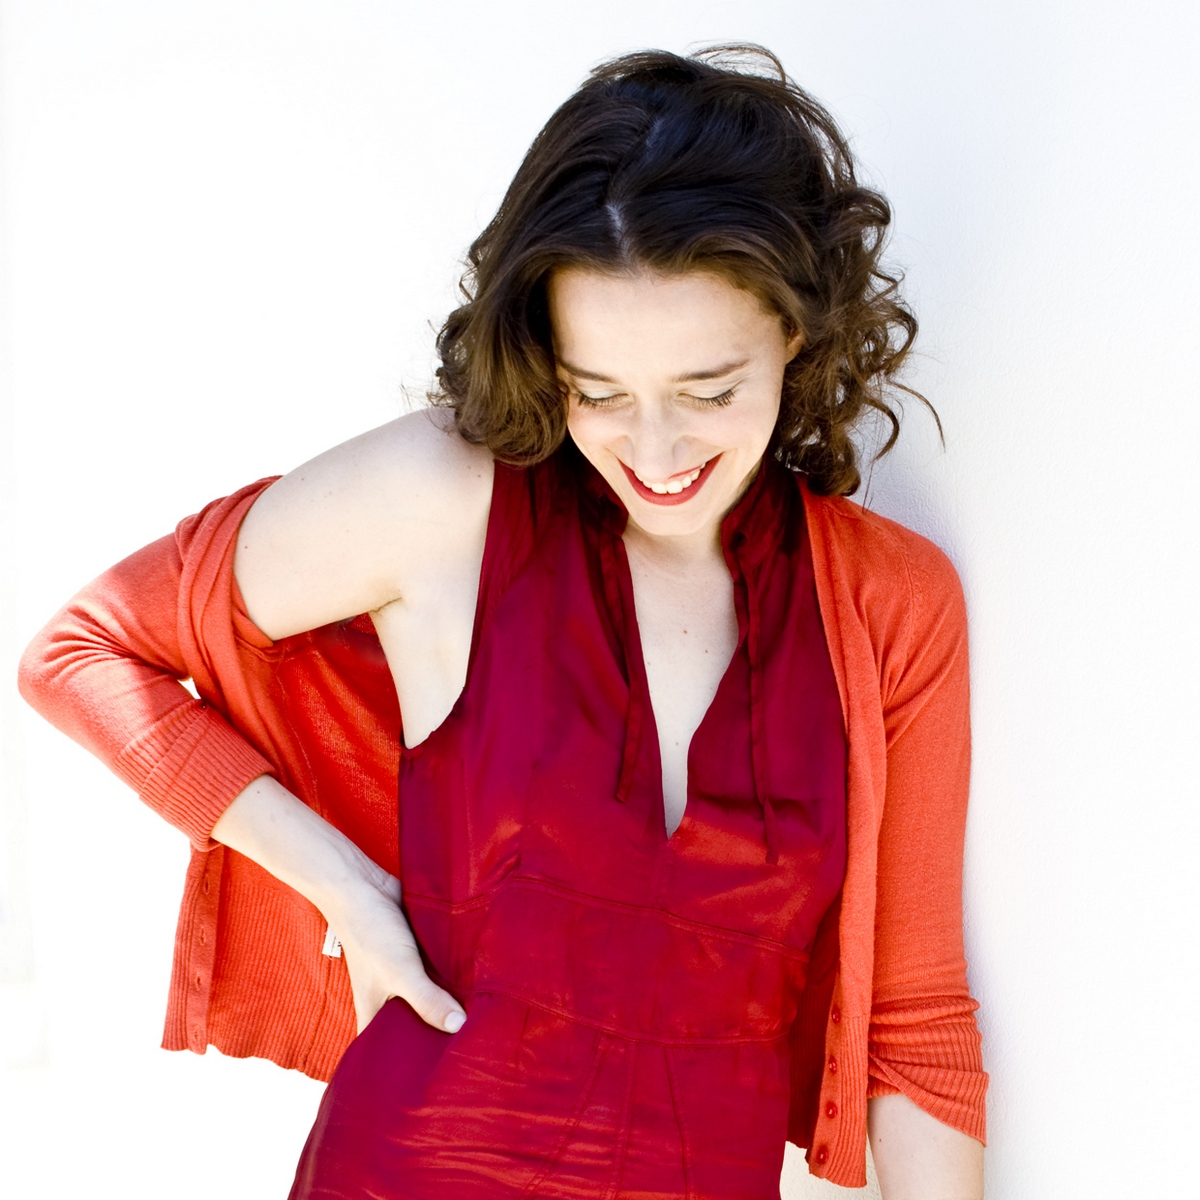 Cristina Renzetti